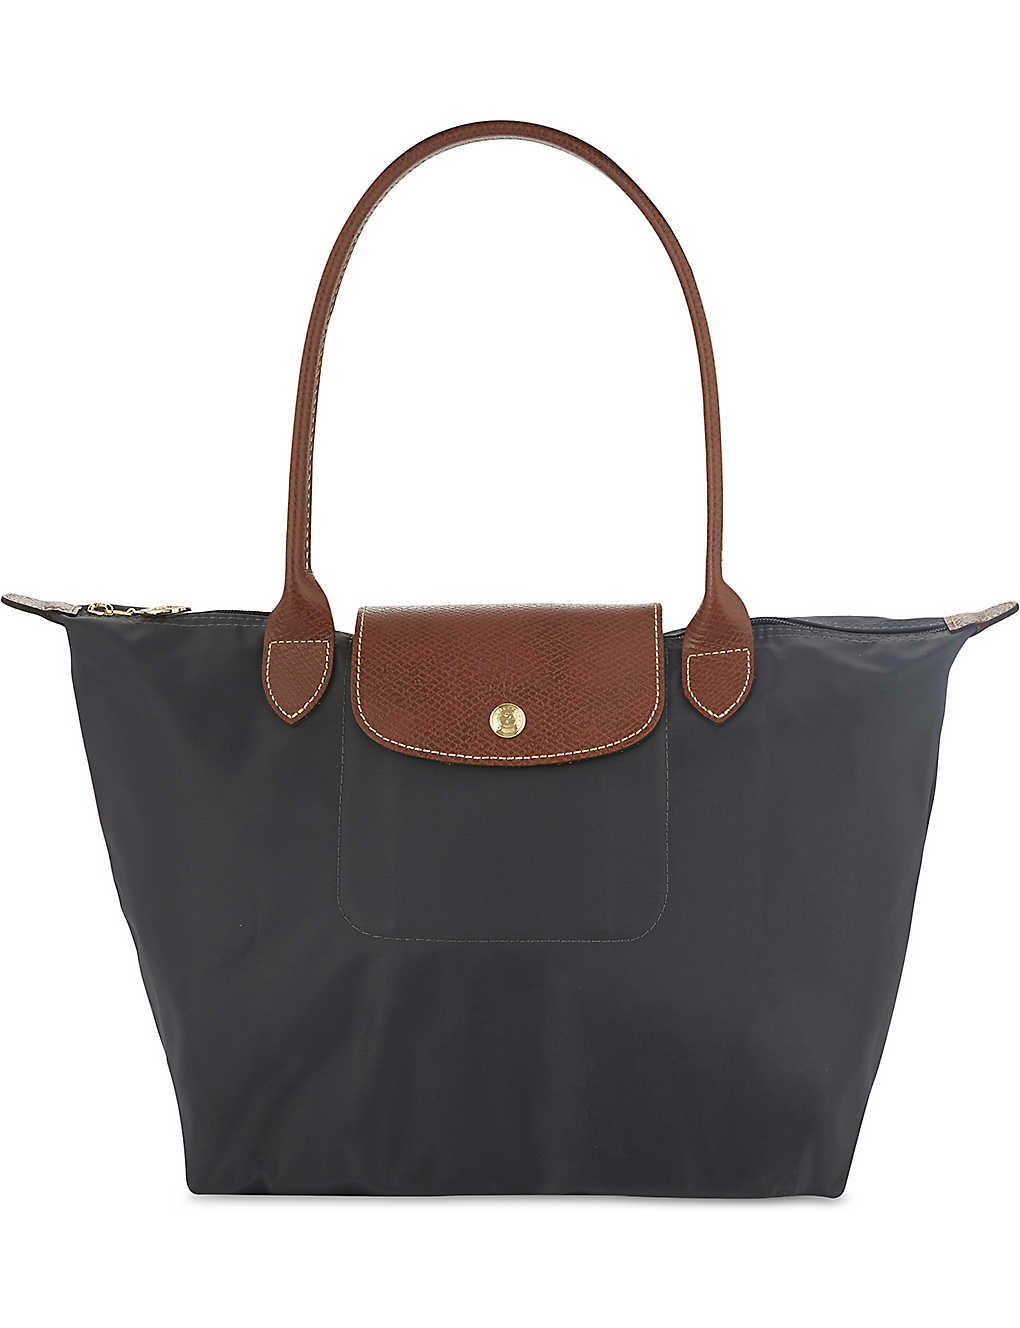 c0207c916 LONGCHAMP - Le Pliage small tote bag | Selfridges.com